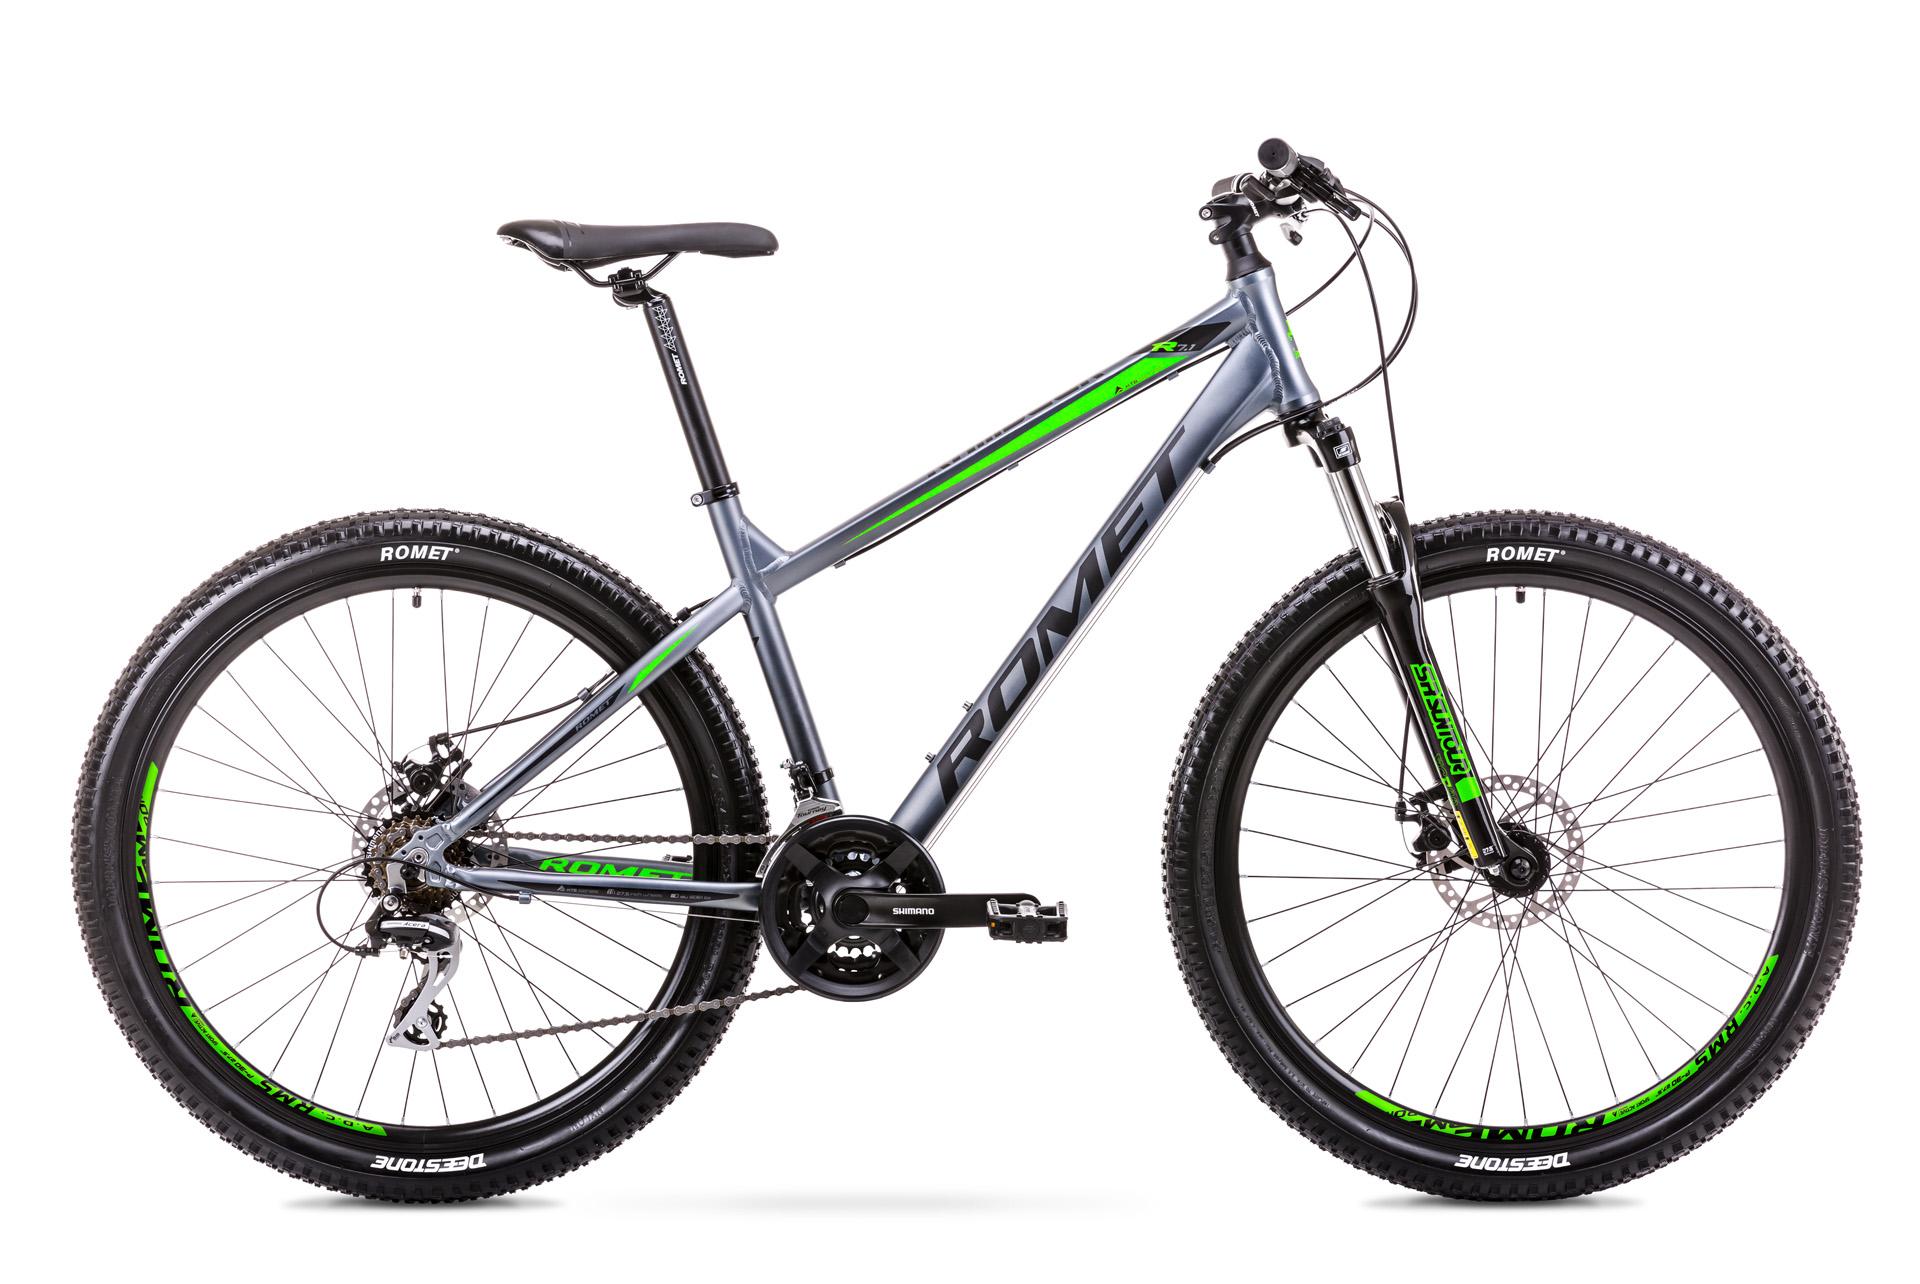 ROMET Rambler R7.1 2019 27,5 650b mountain bike kerékpár grafit